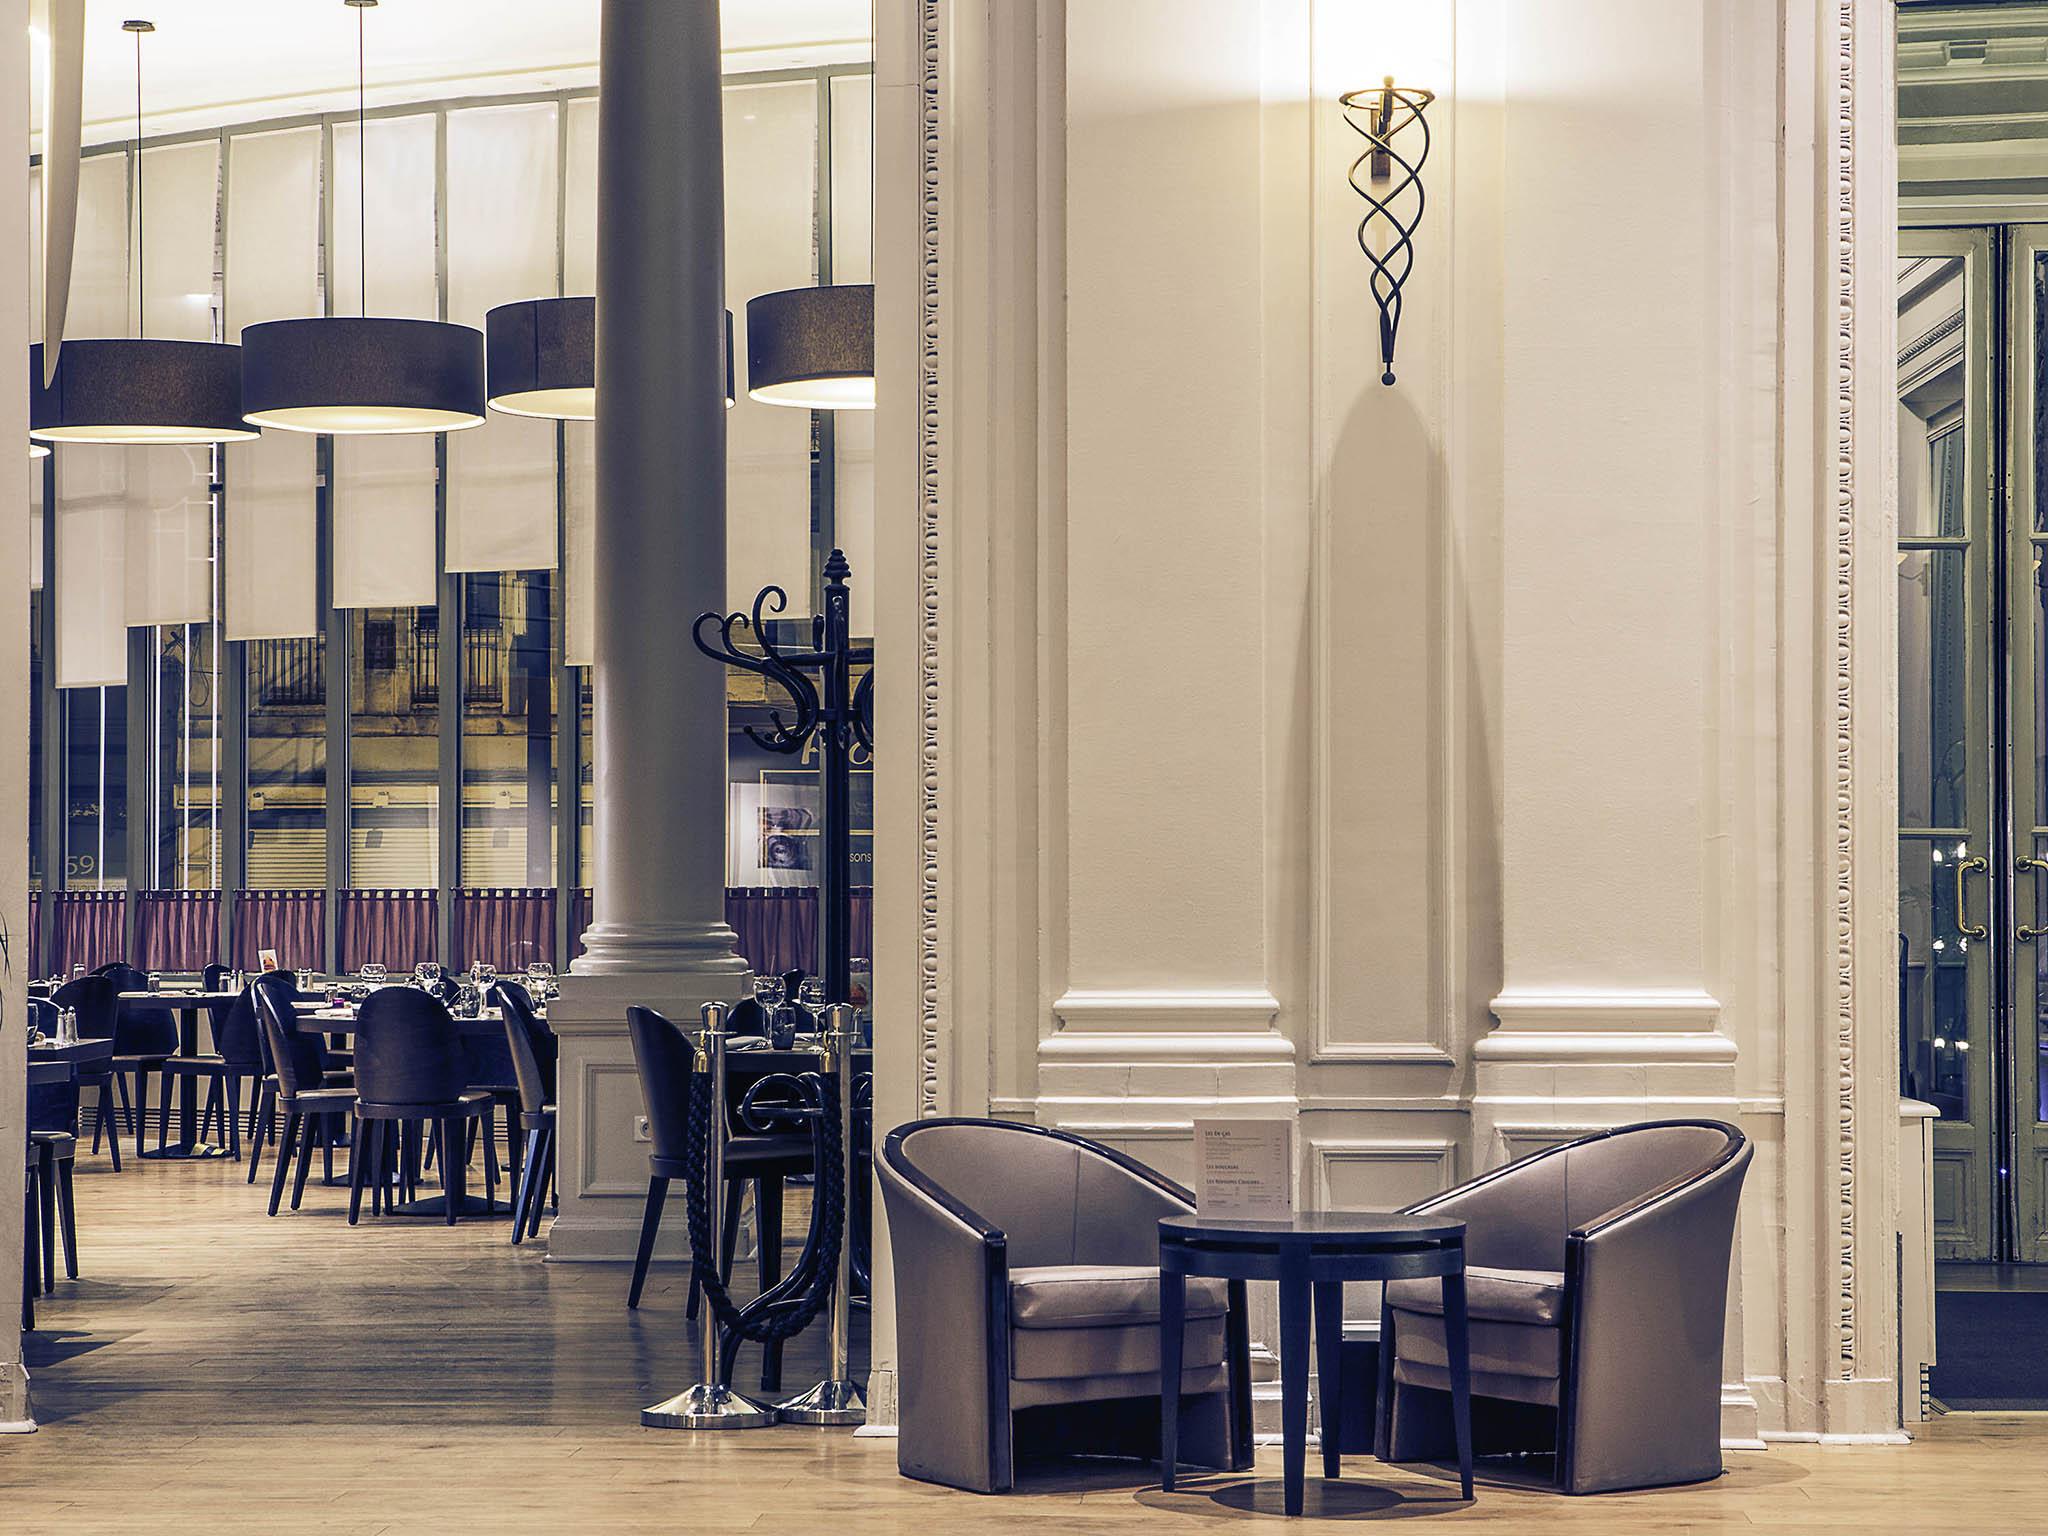 Hotel - Mercure Lille Roubaix Grand Hôtel